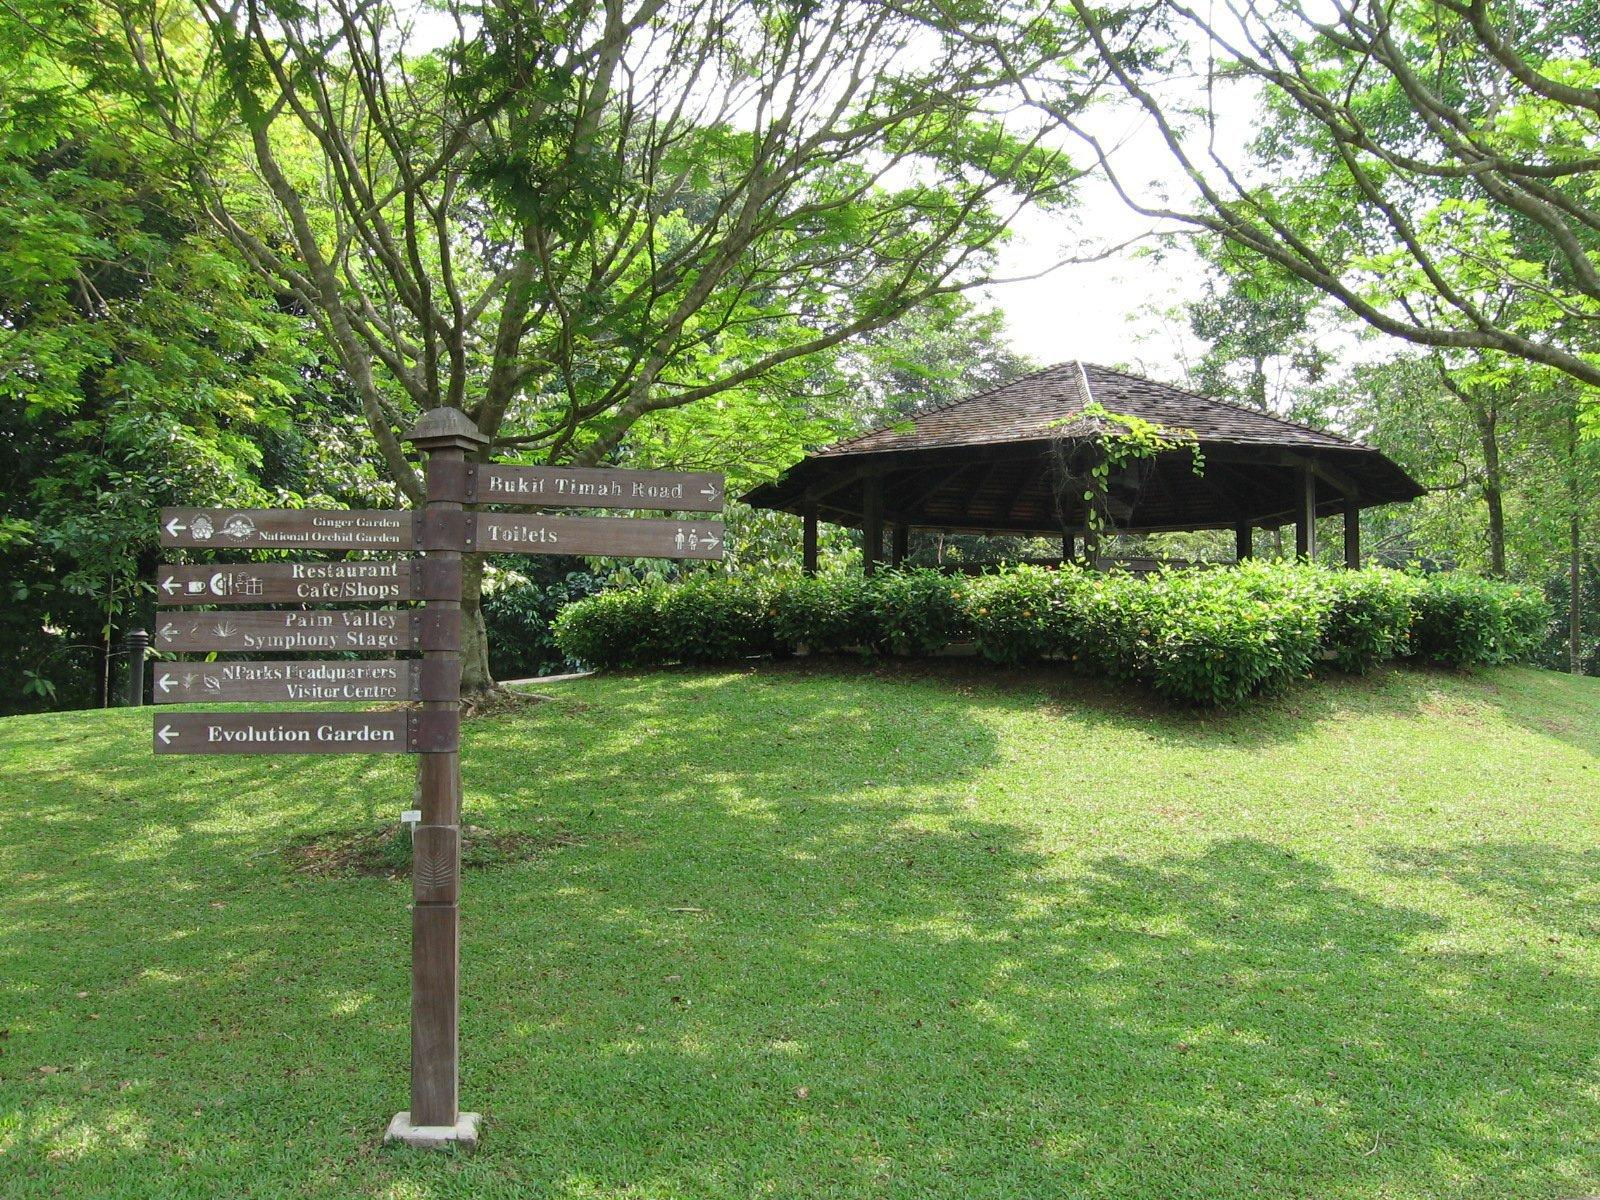 Singapore_Botanic_Gardens,_Bukit_Timah_Core,_Sep_06